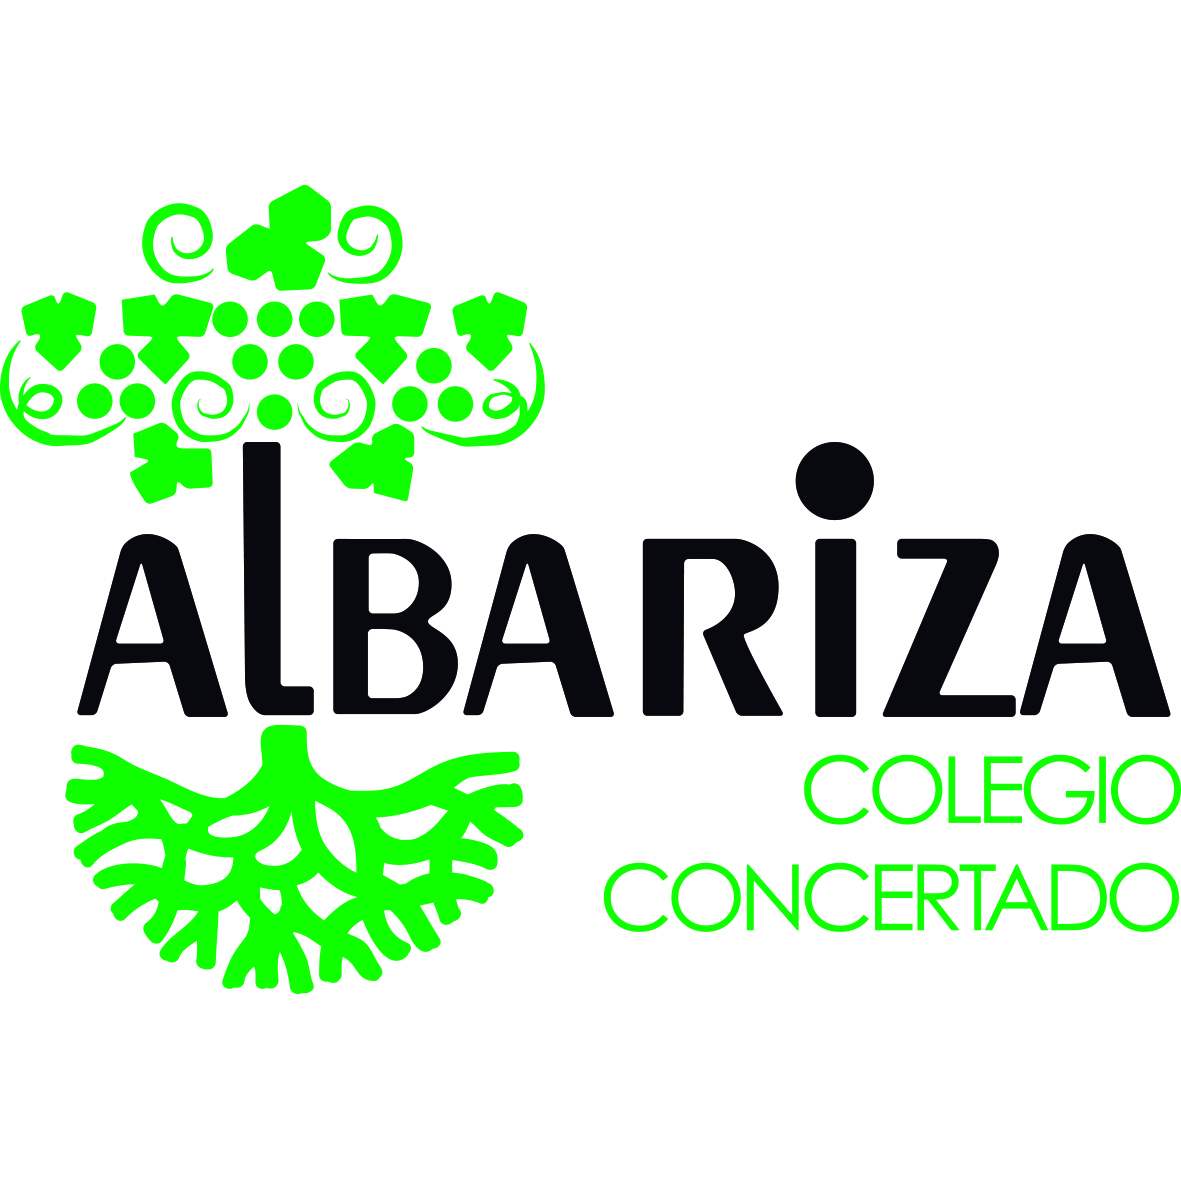 ColegioAñbariza